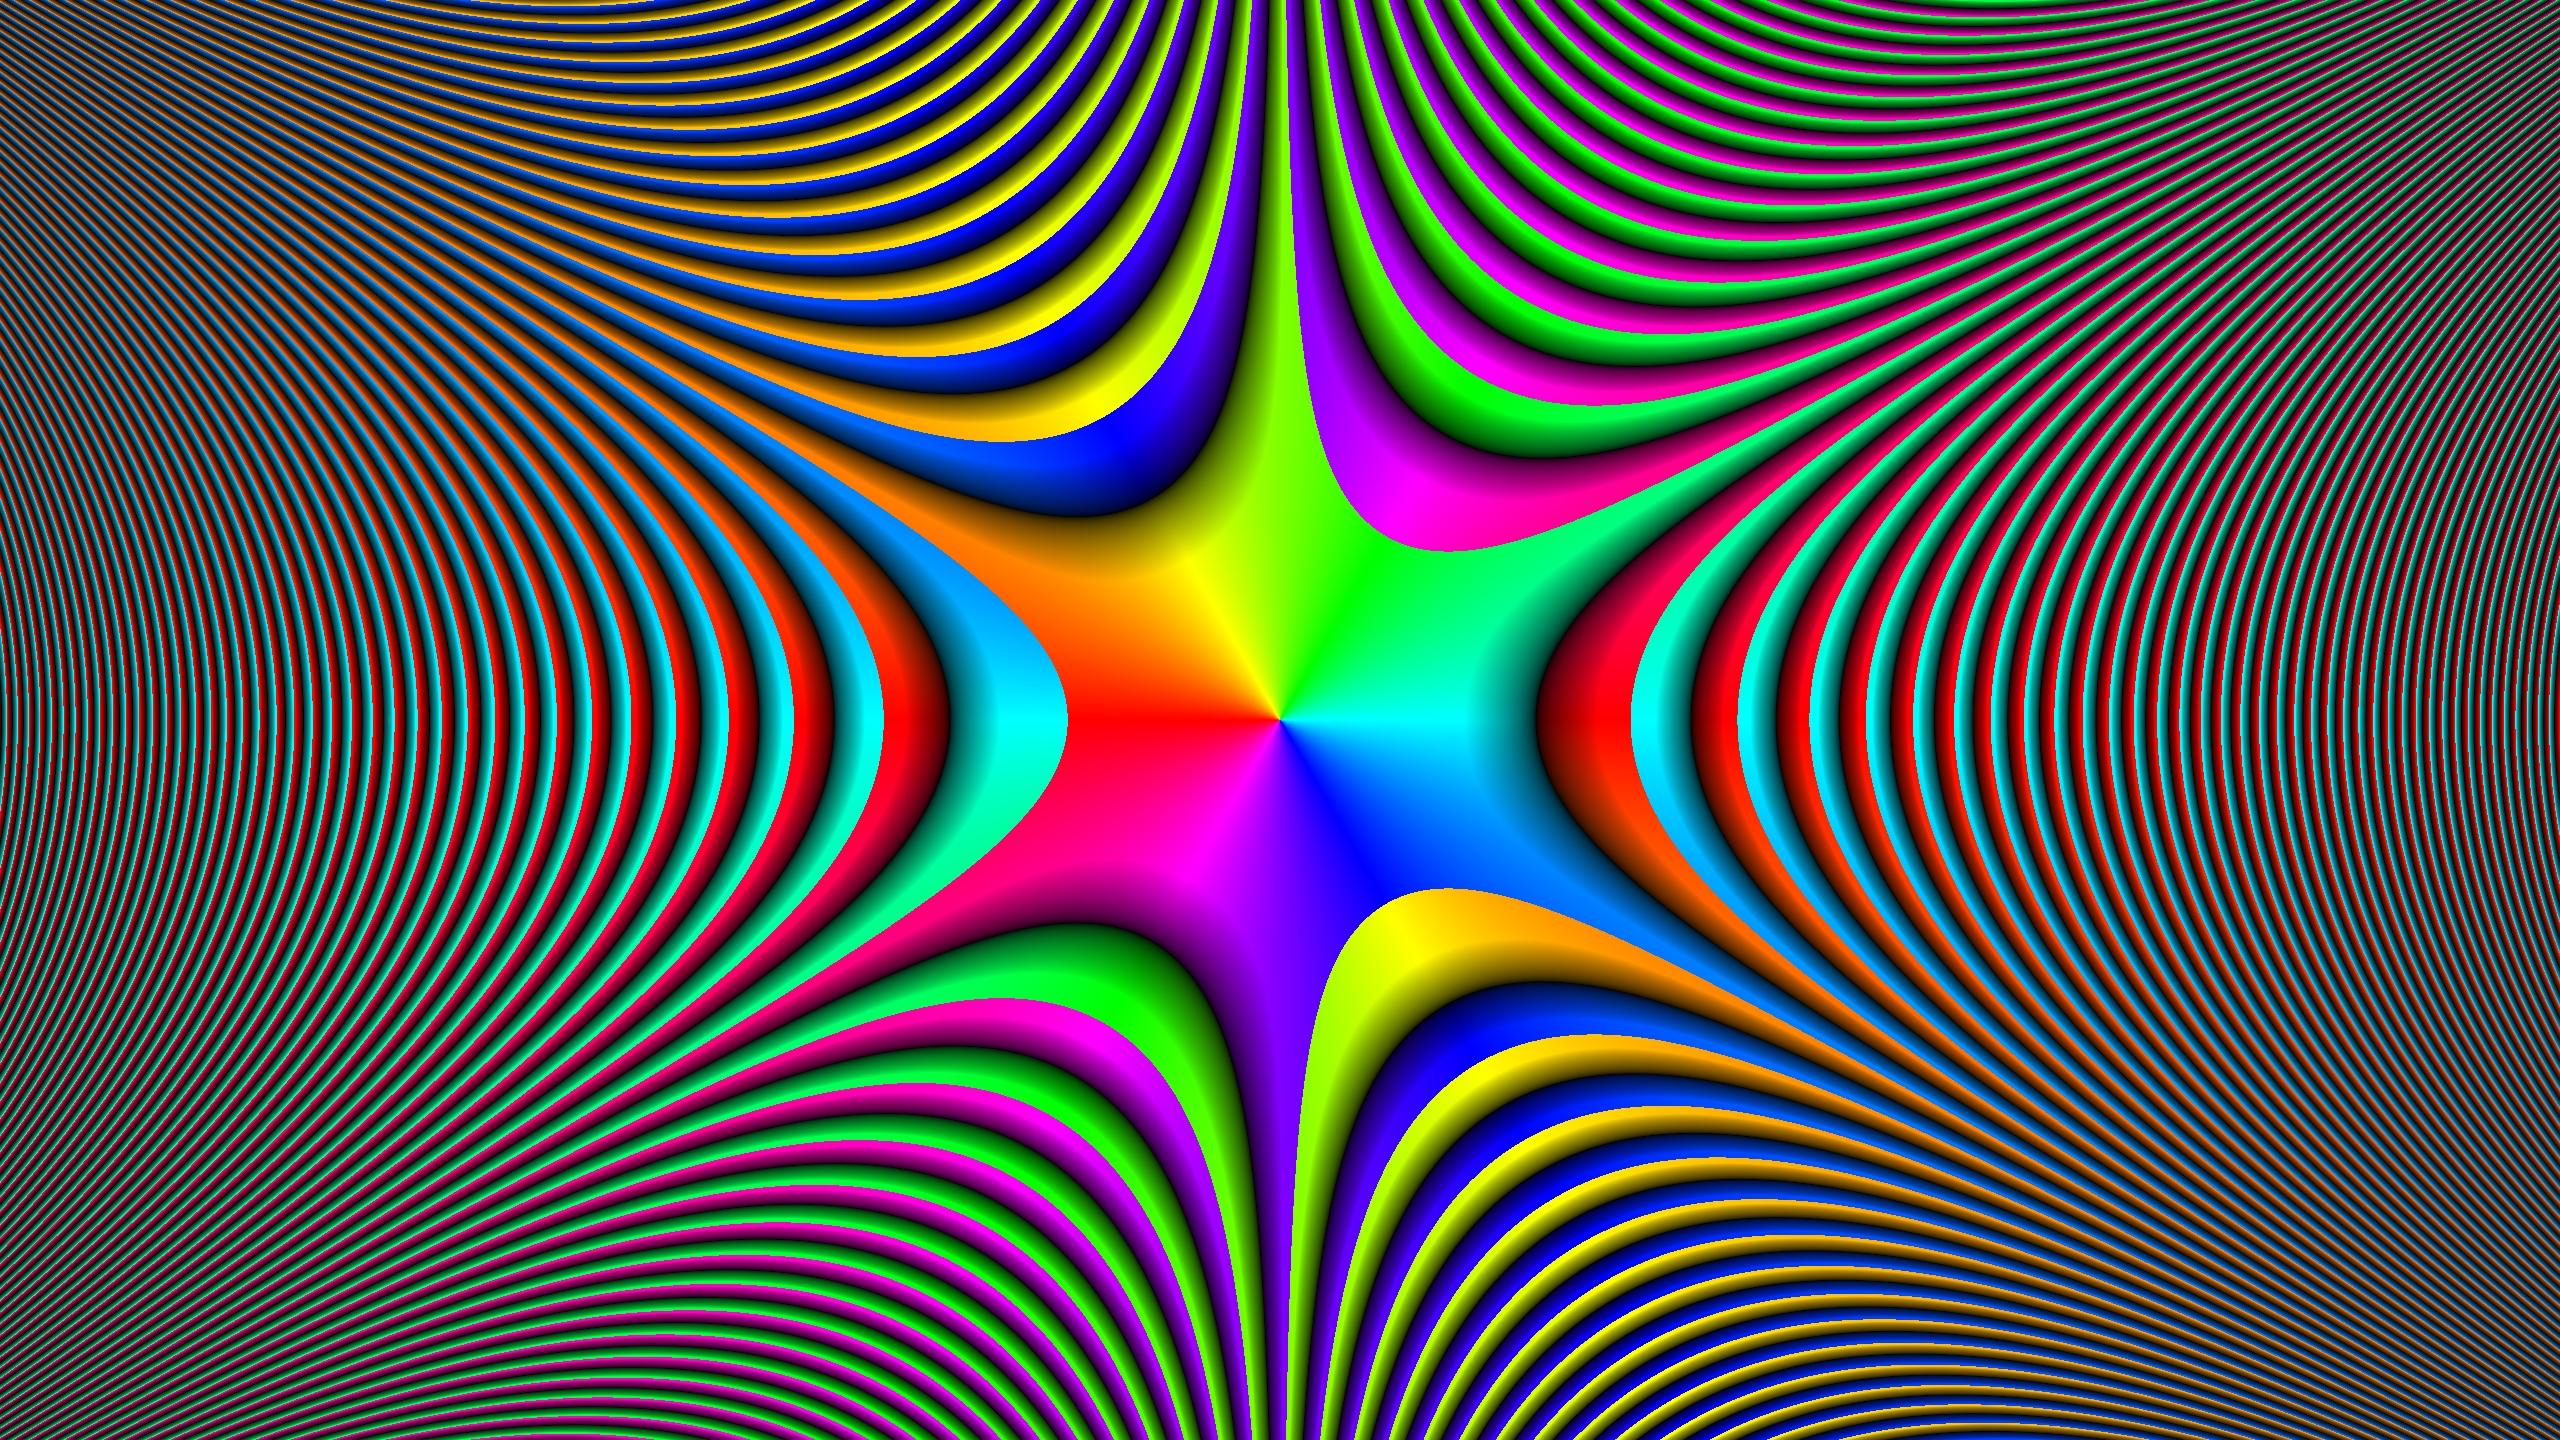 Illusion Hd Wallpaper Background Image 2560x1440 Id